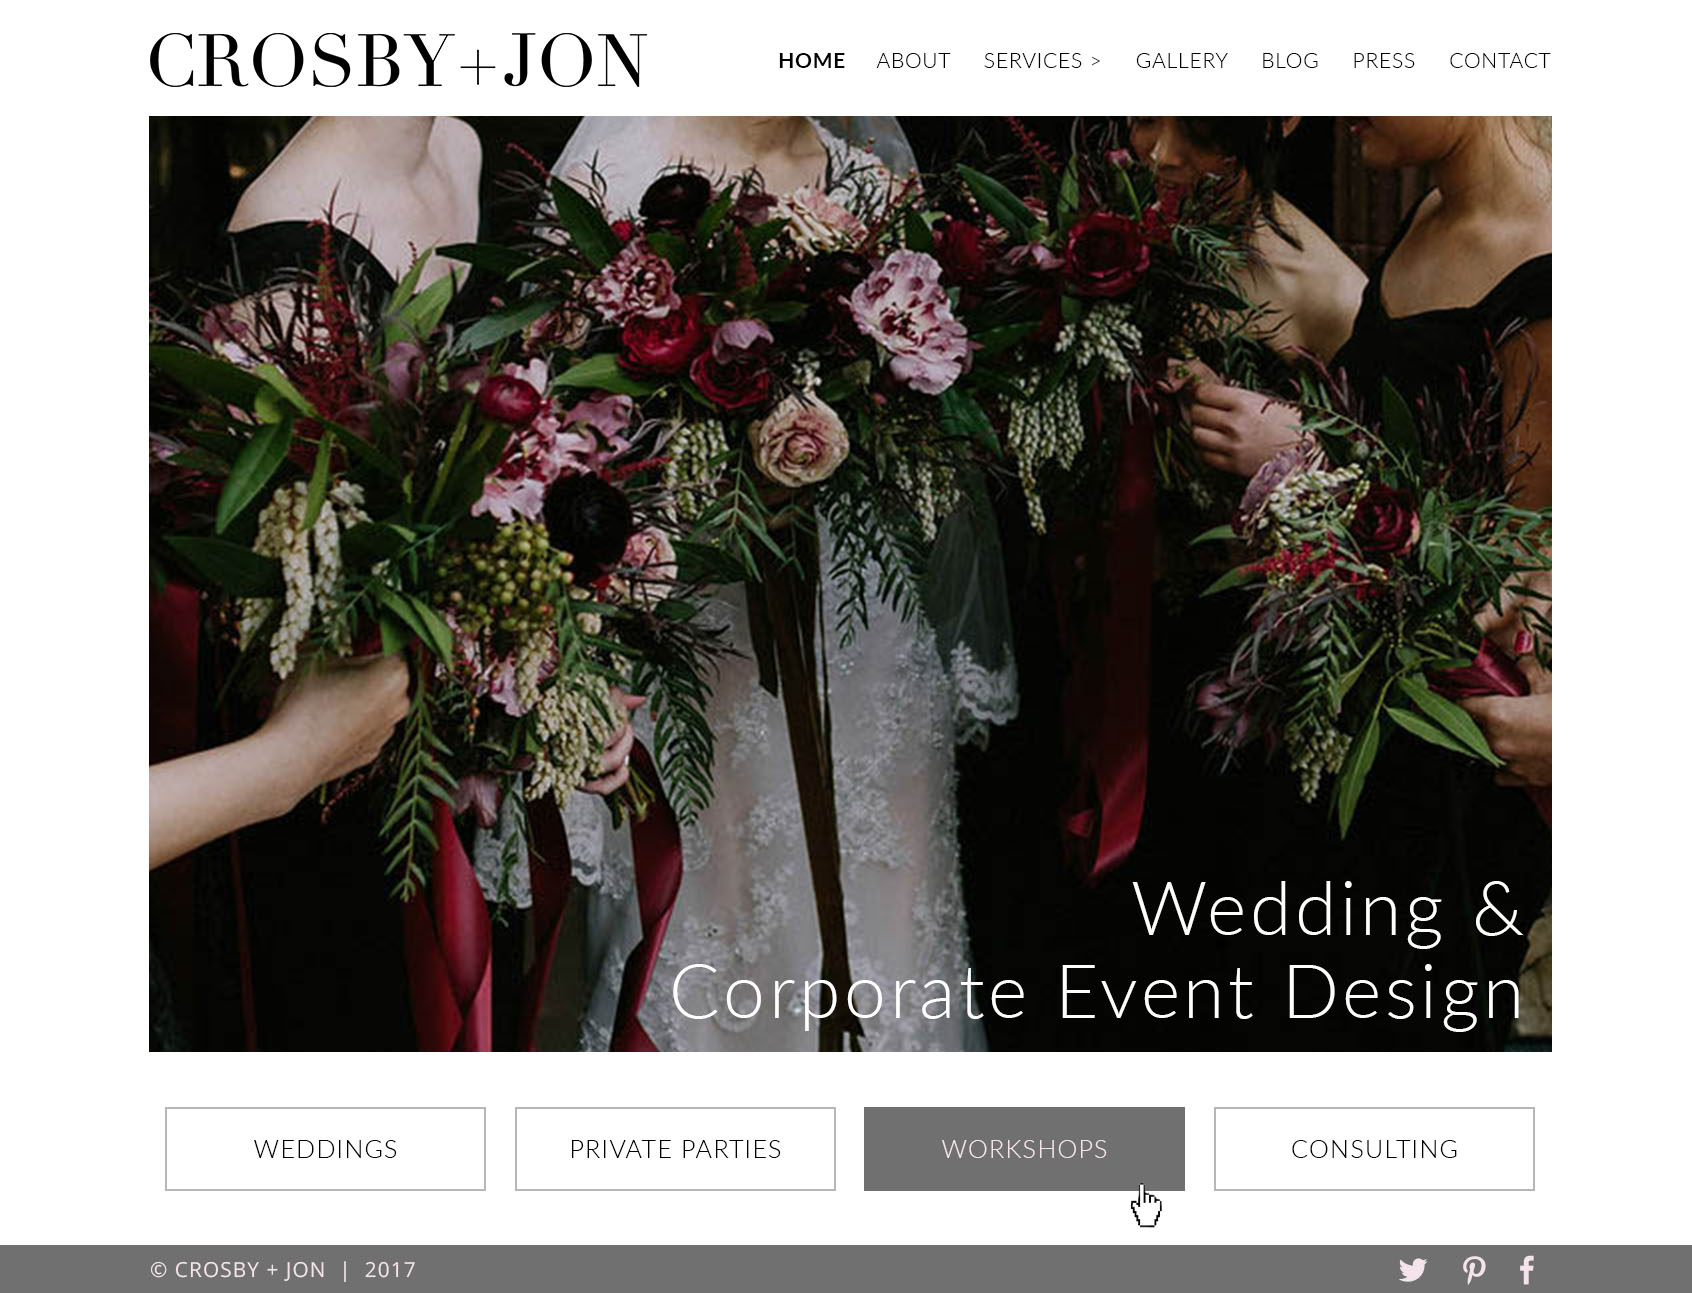 Crosby + Jon Home Page Alternate